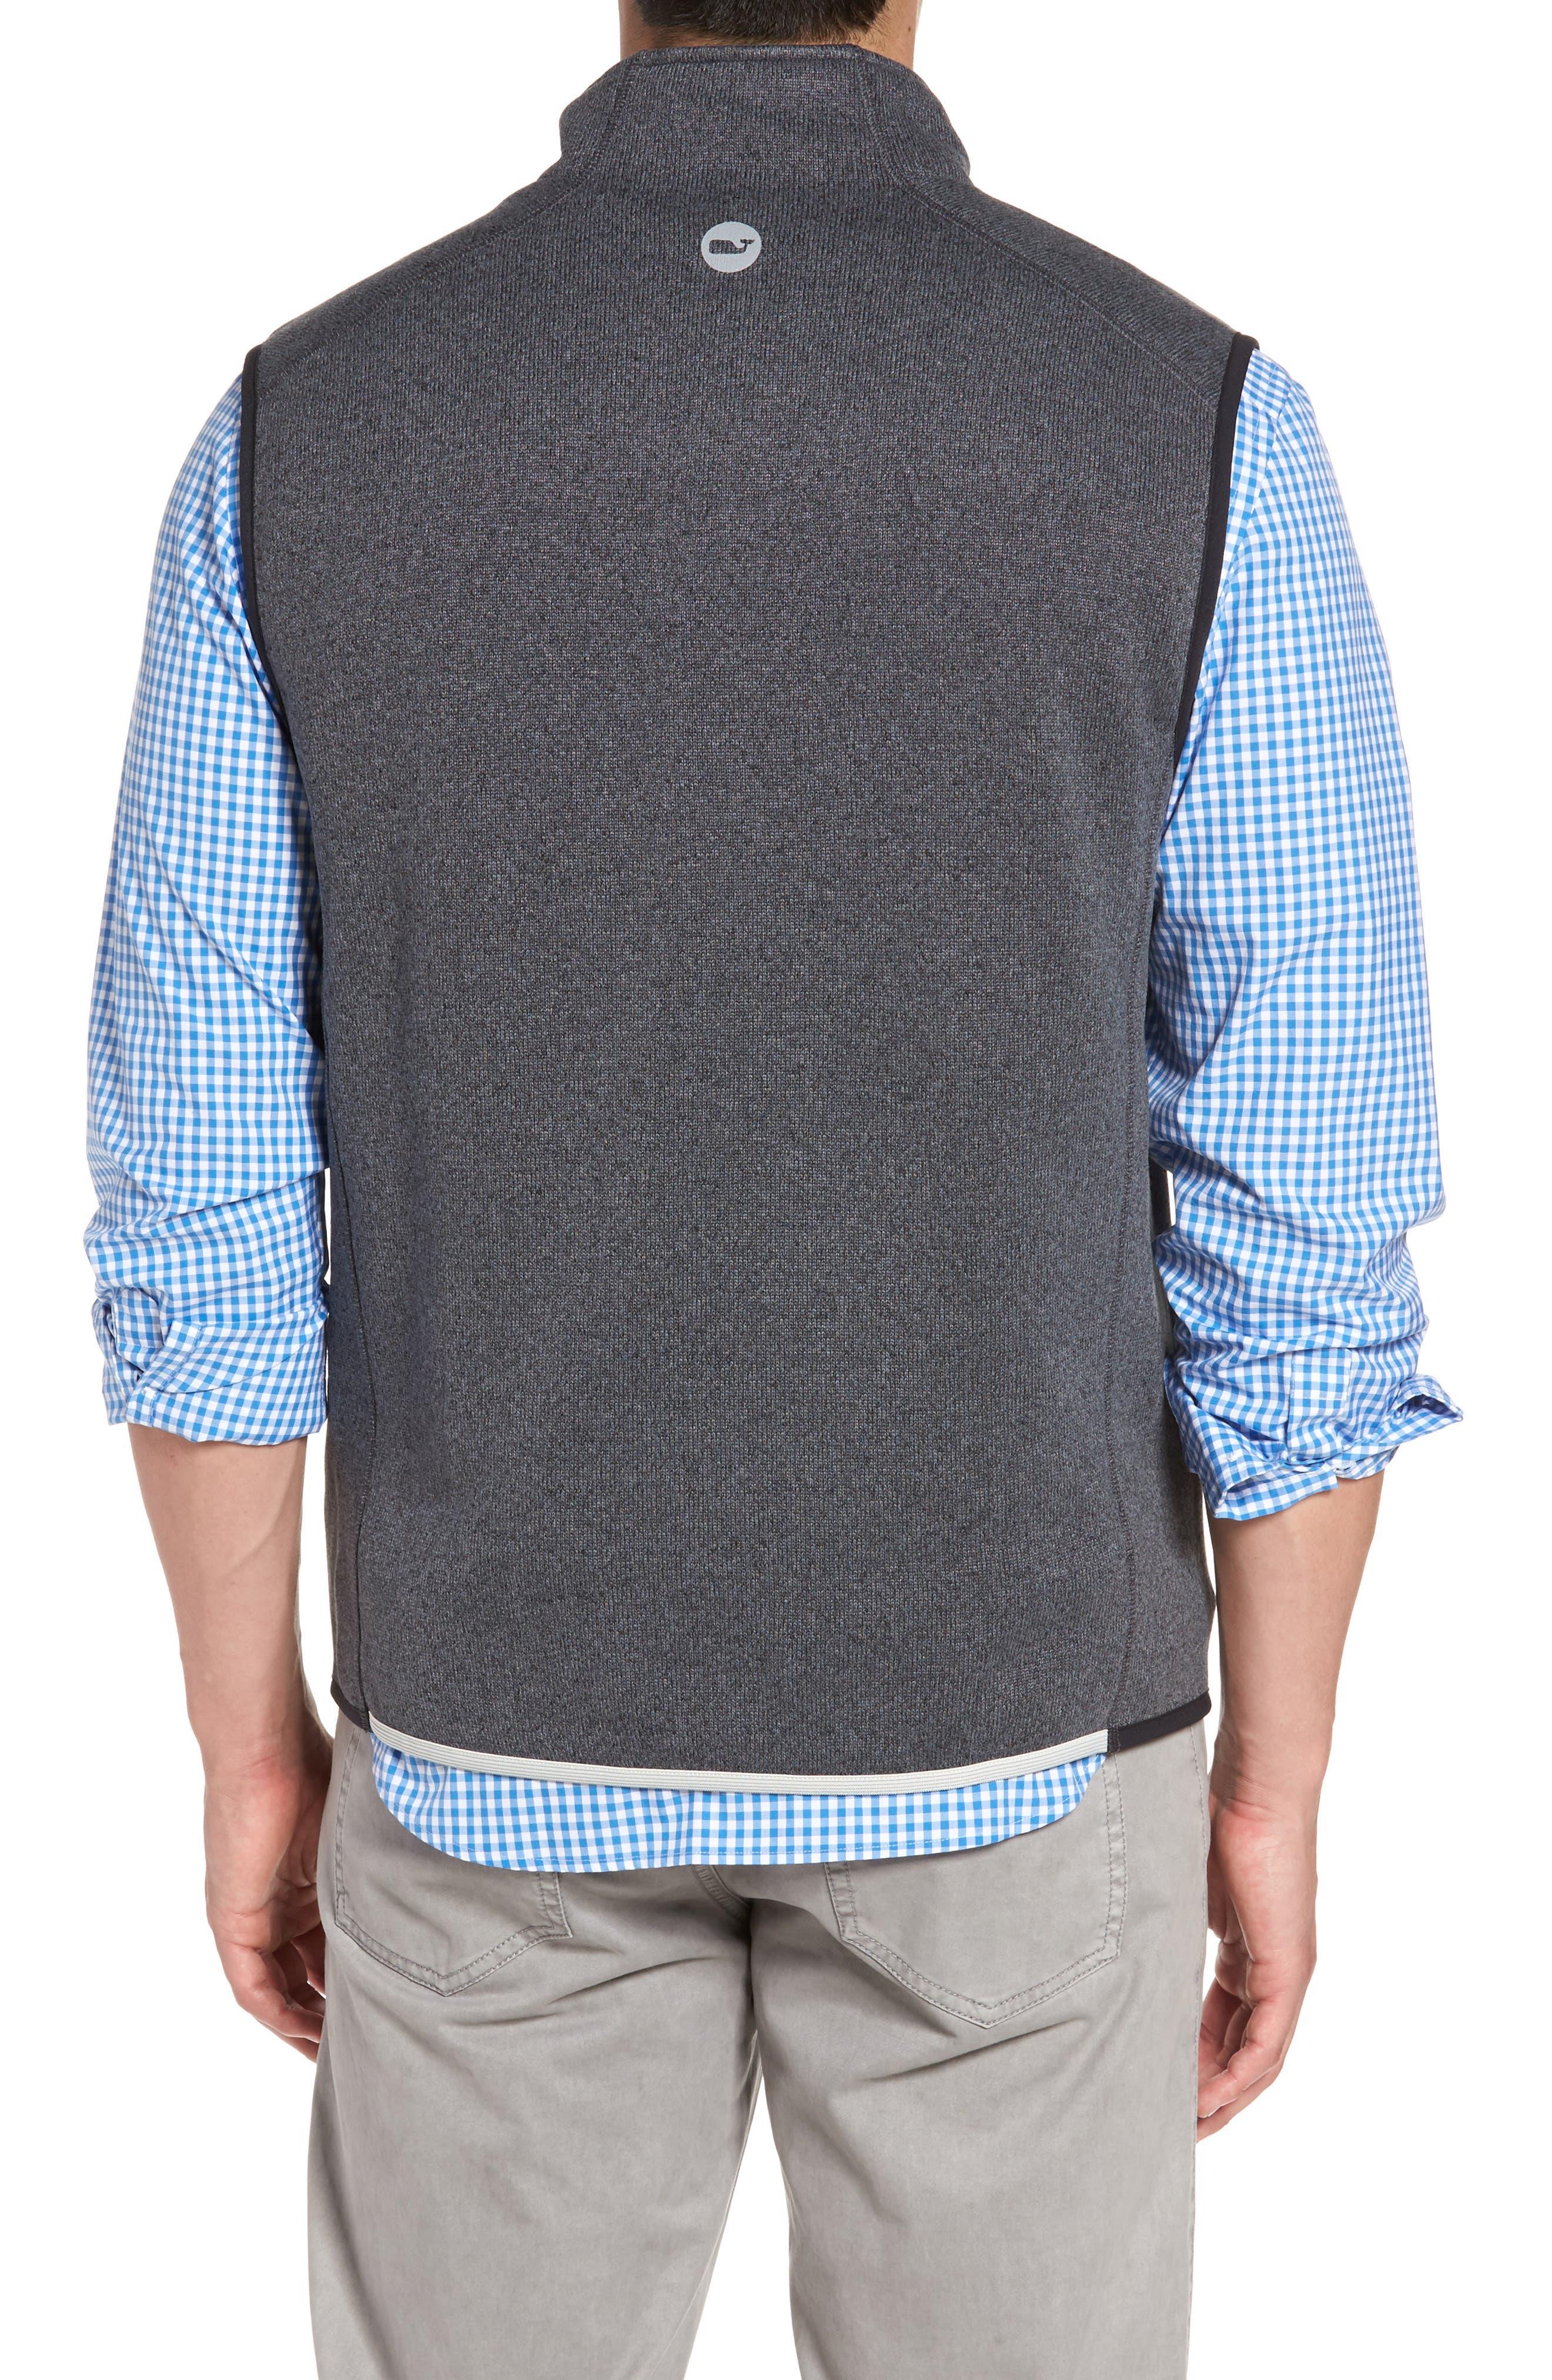 Alternate Image 2  - vineyard vines Tech Sweater Fleece Vest